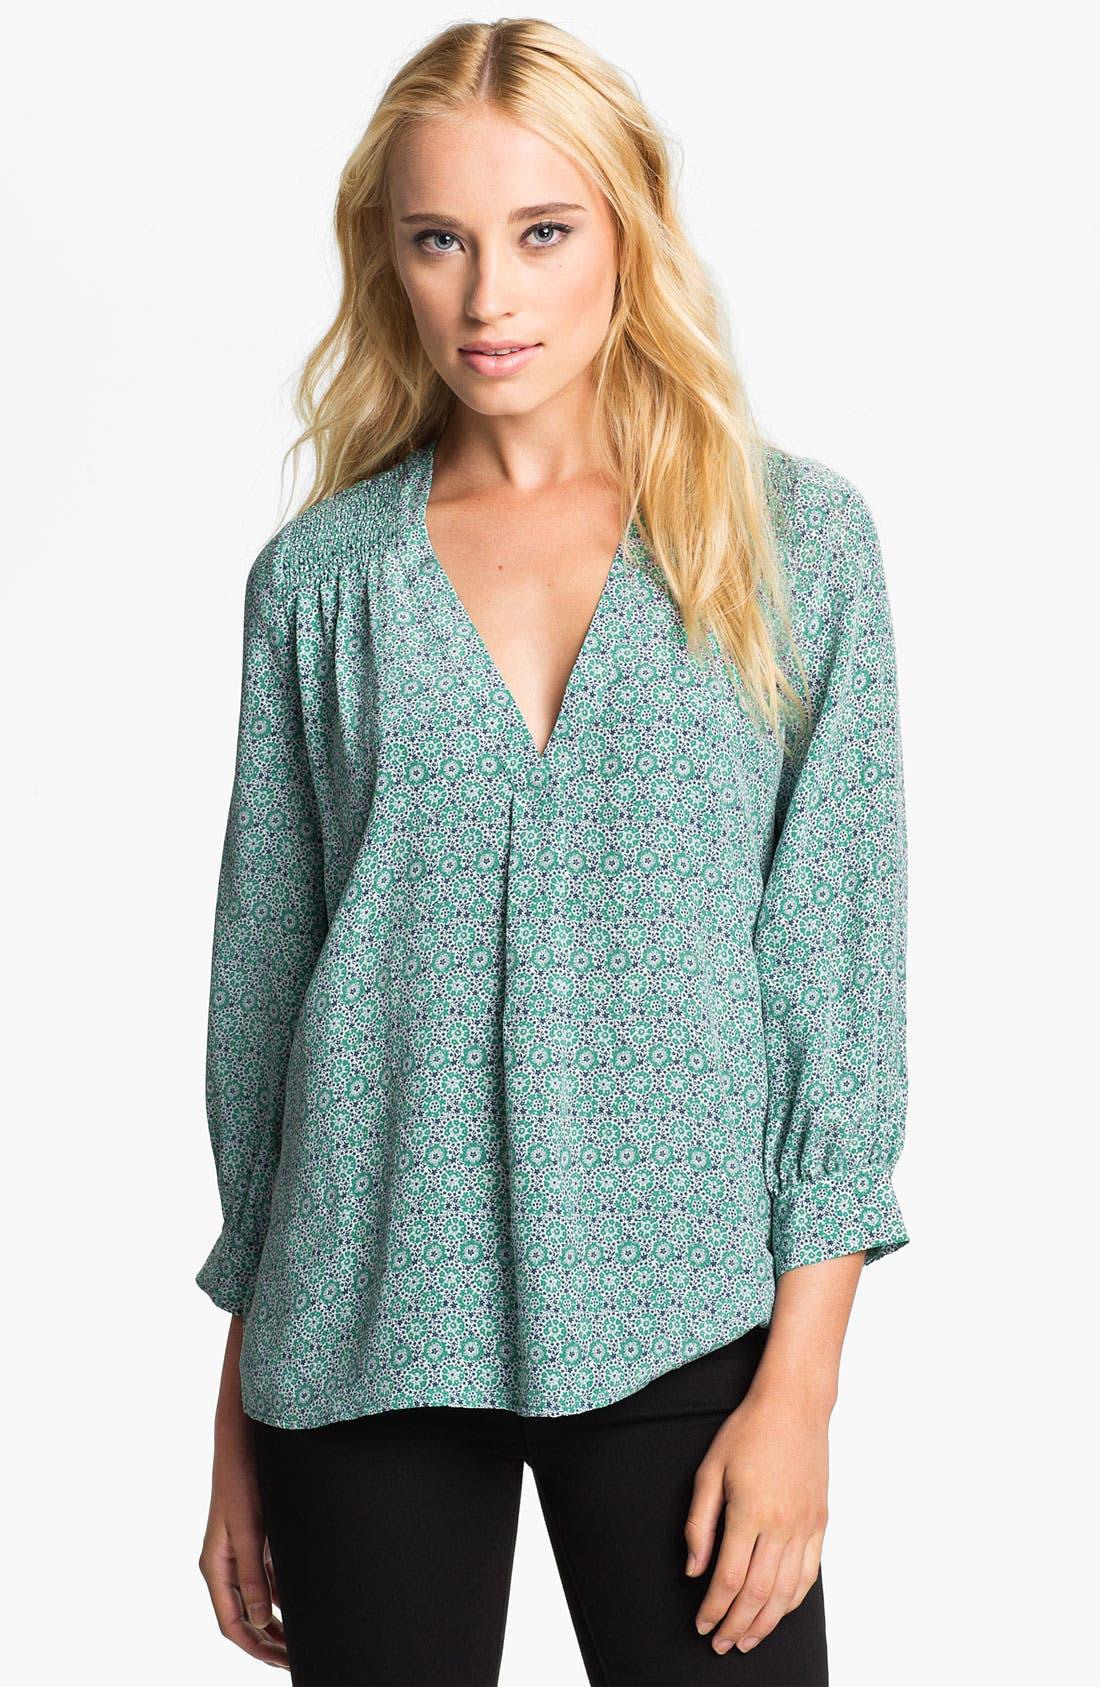 Main Image - Joie 'Aceline' Sheer Print Silk V-Neck Top